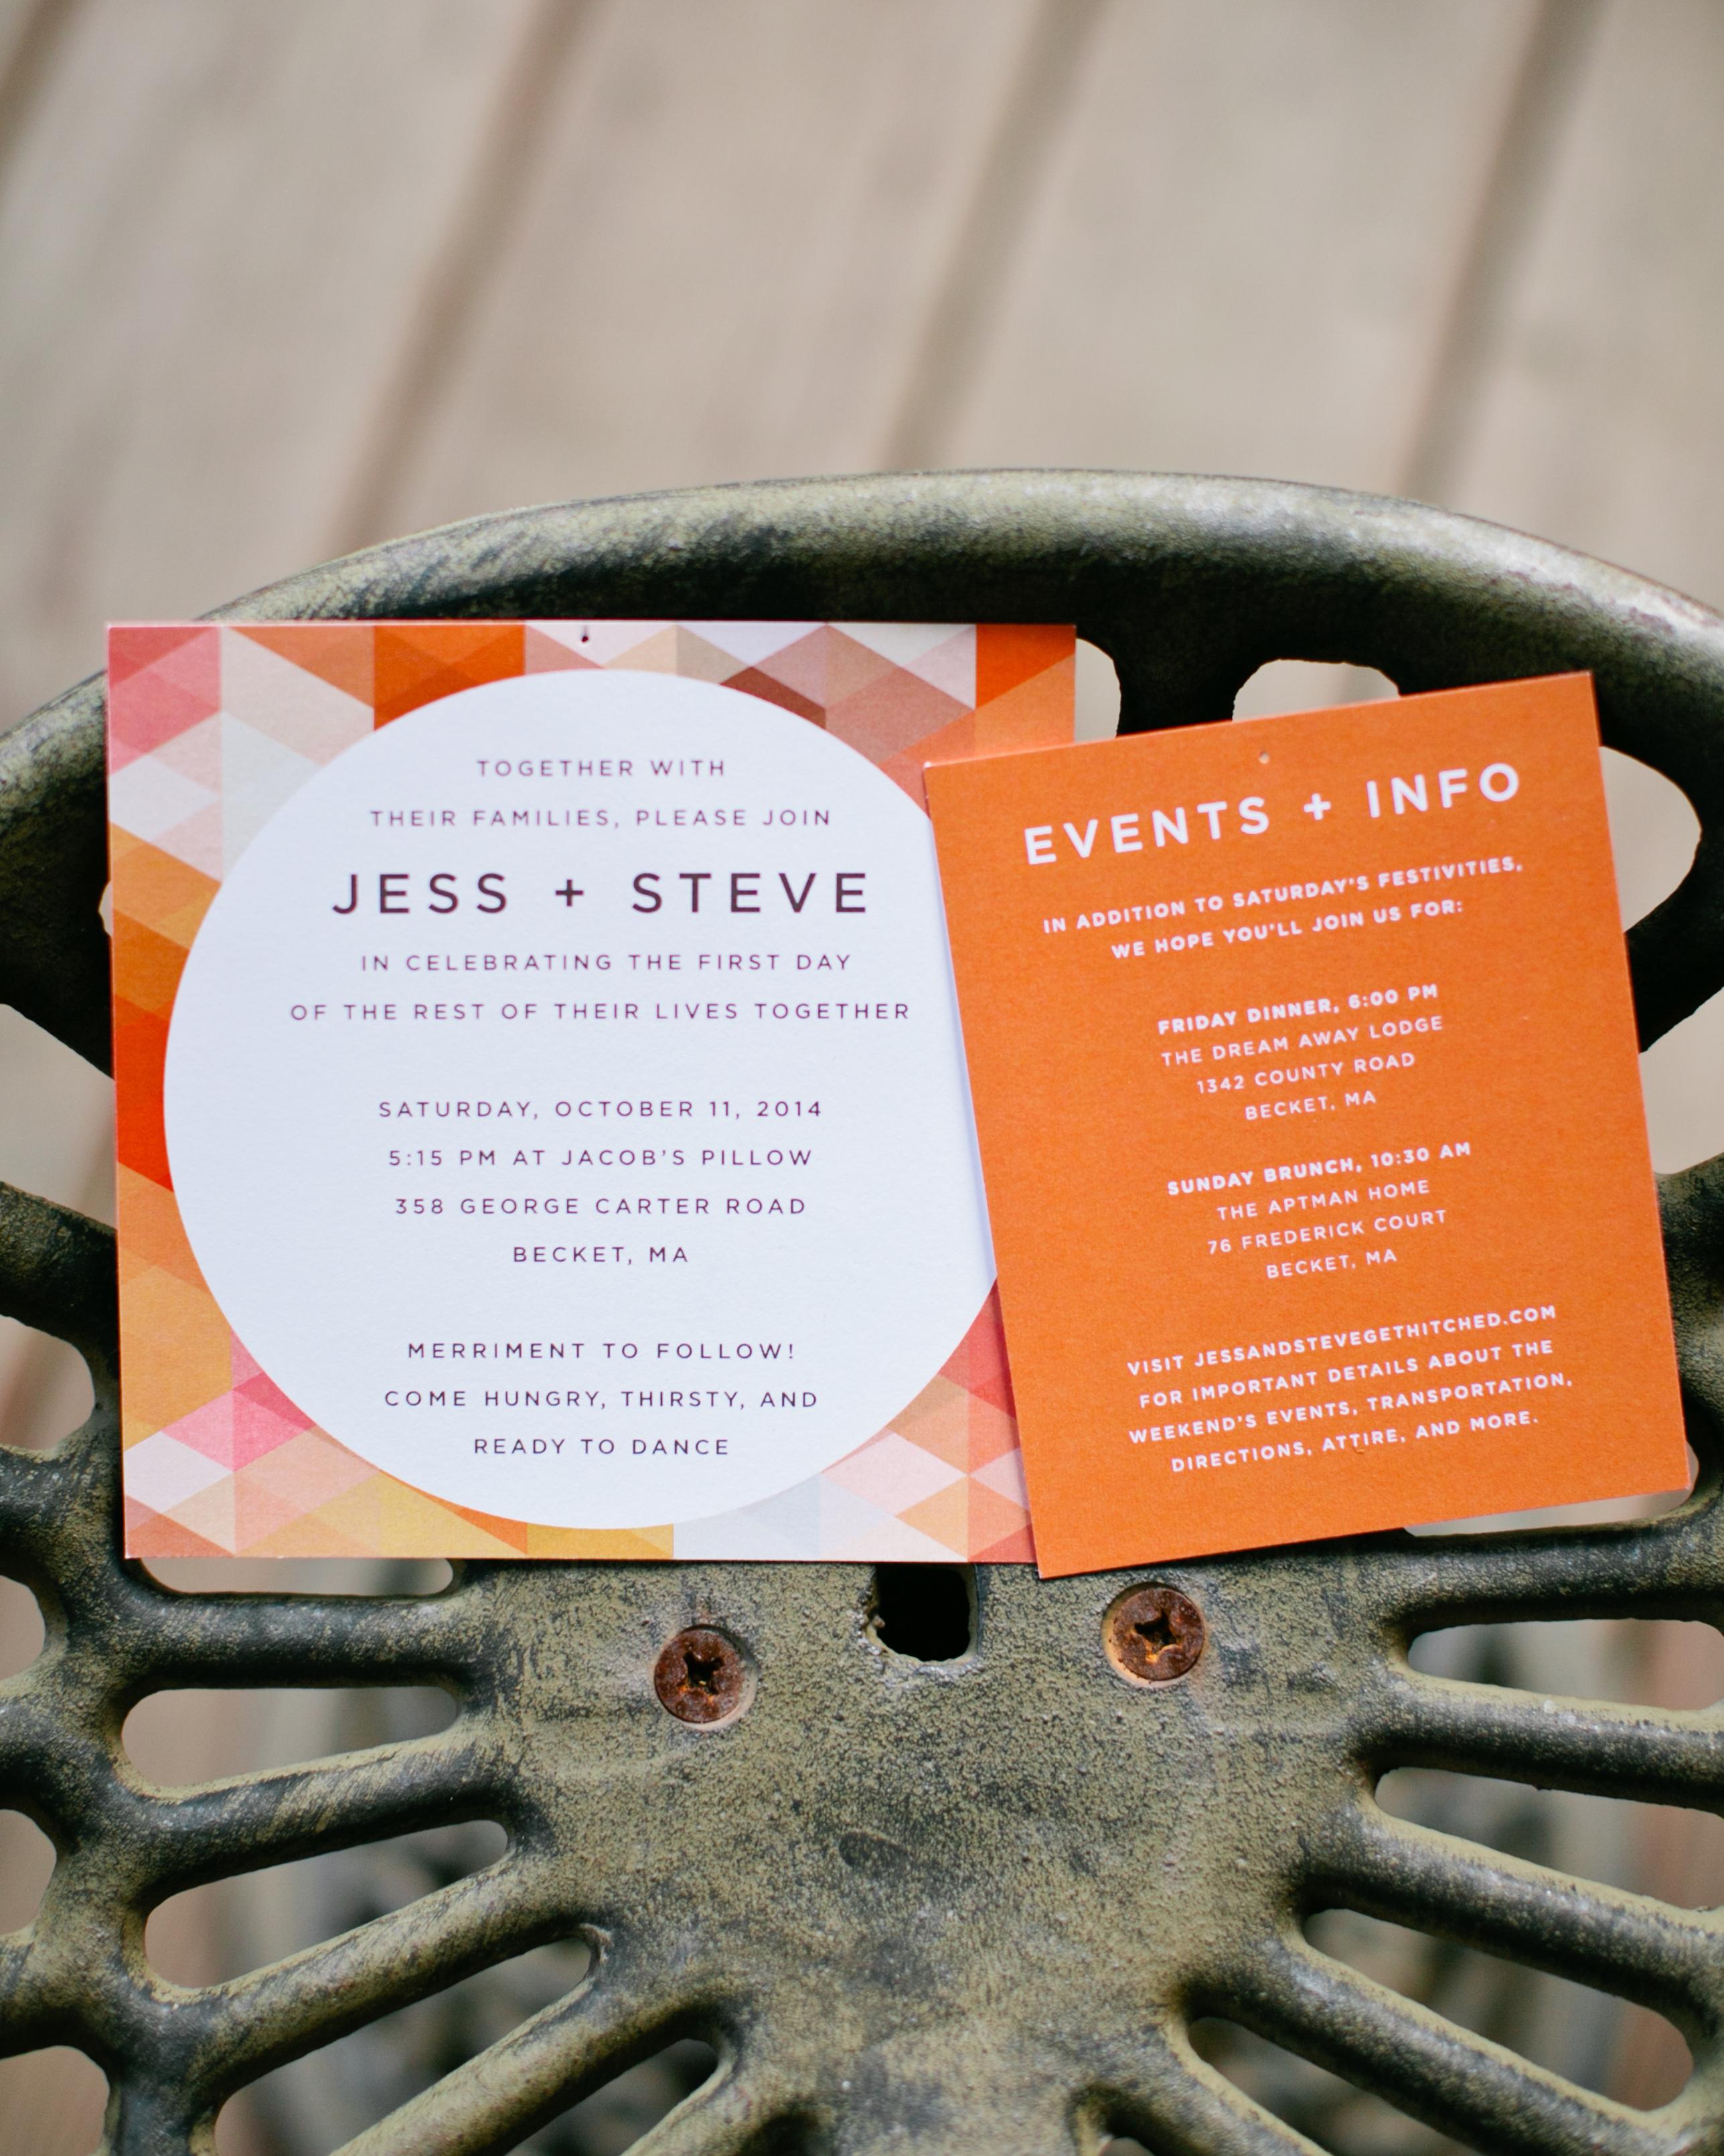 jess-steve-wedding-stationery-23-s112362-1115.jpg